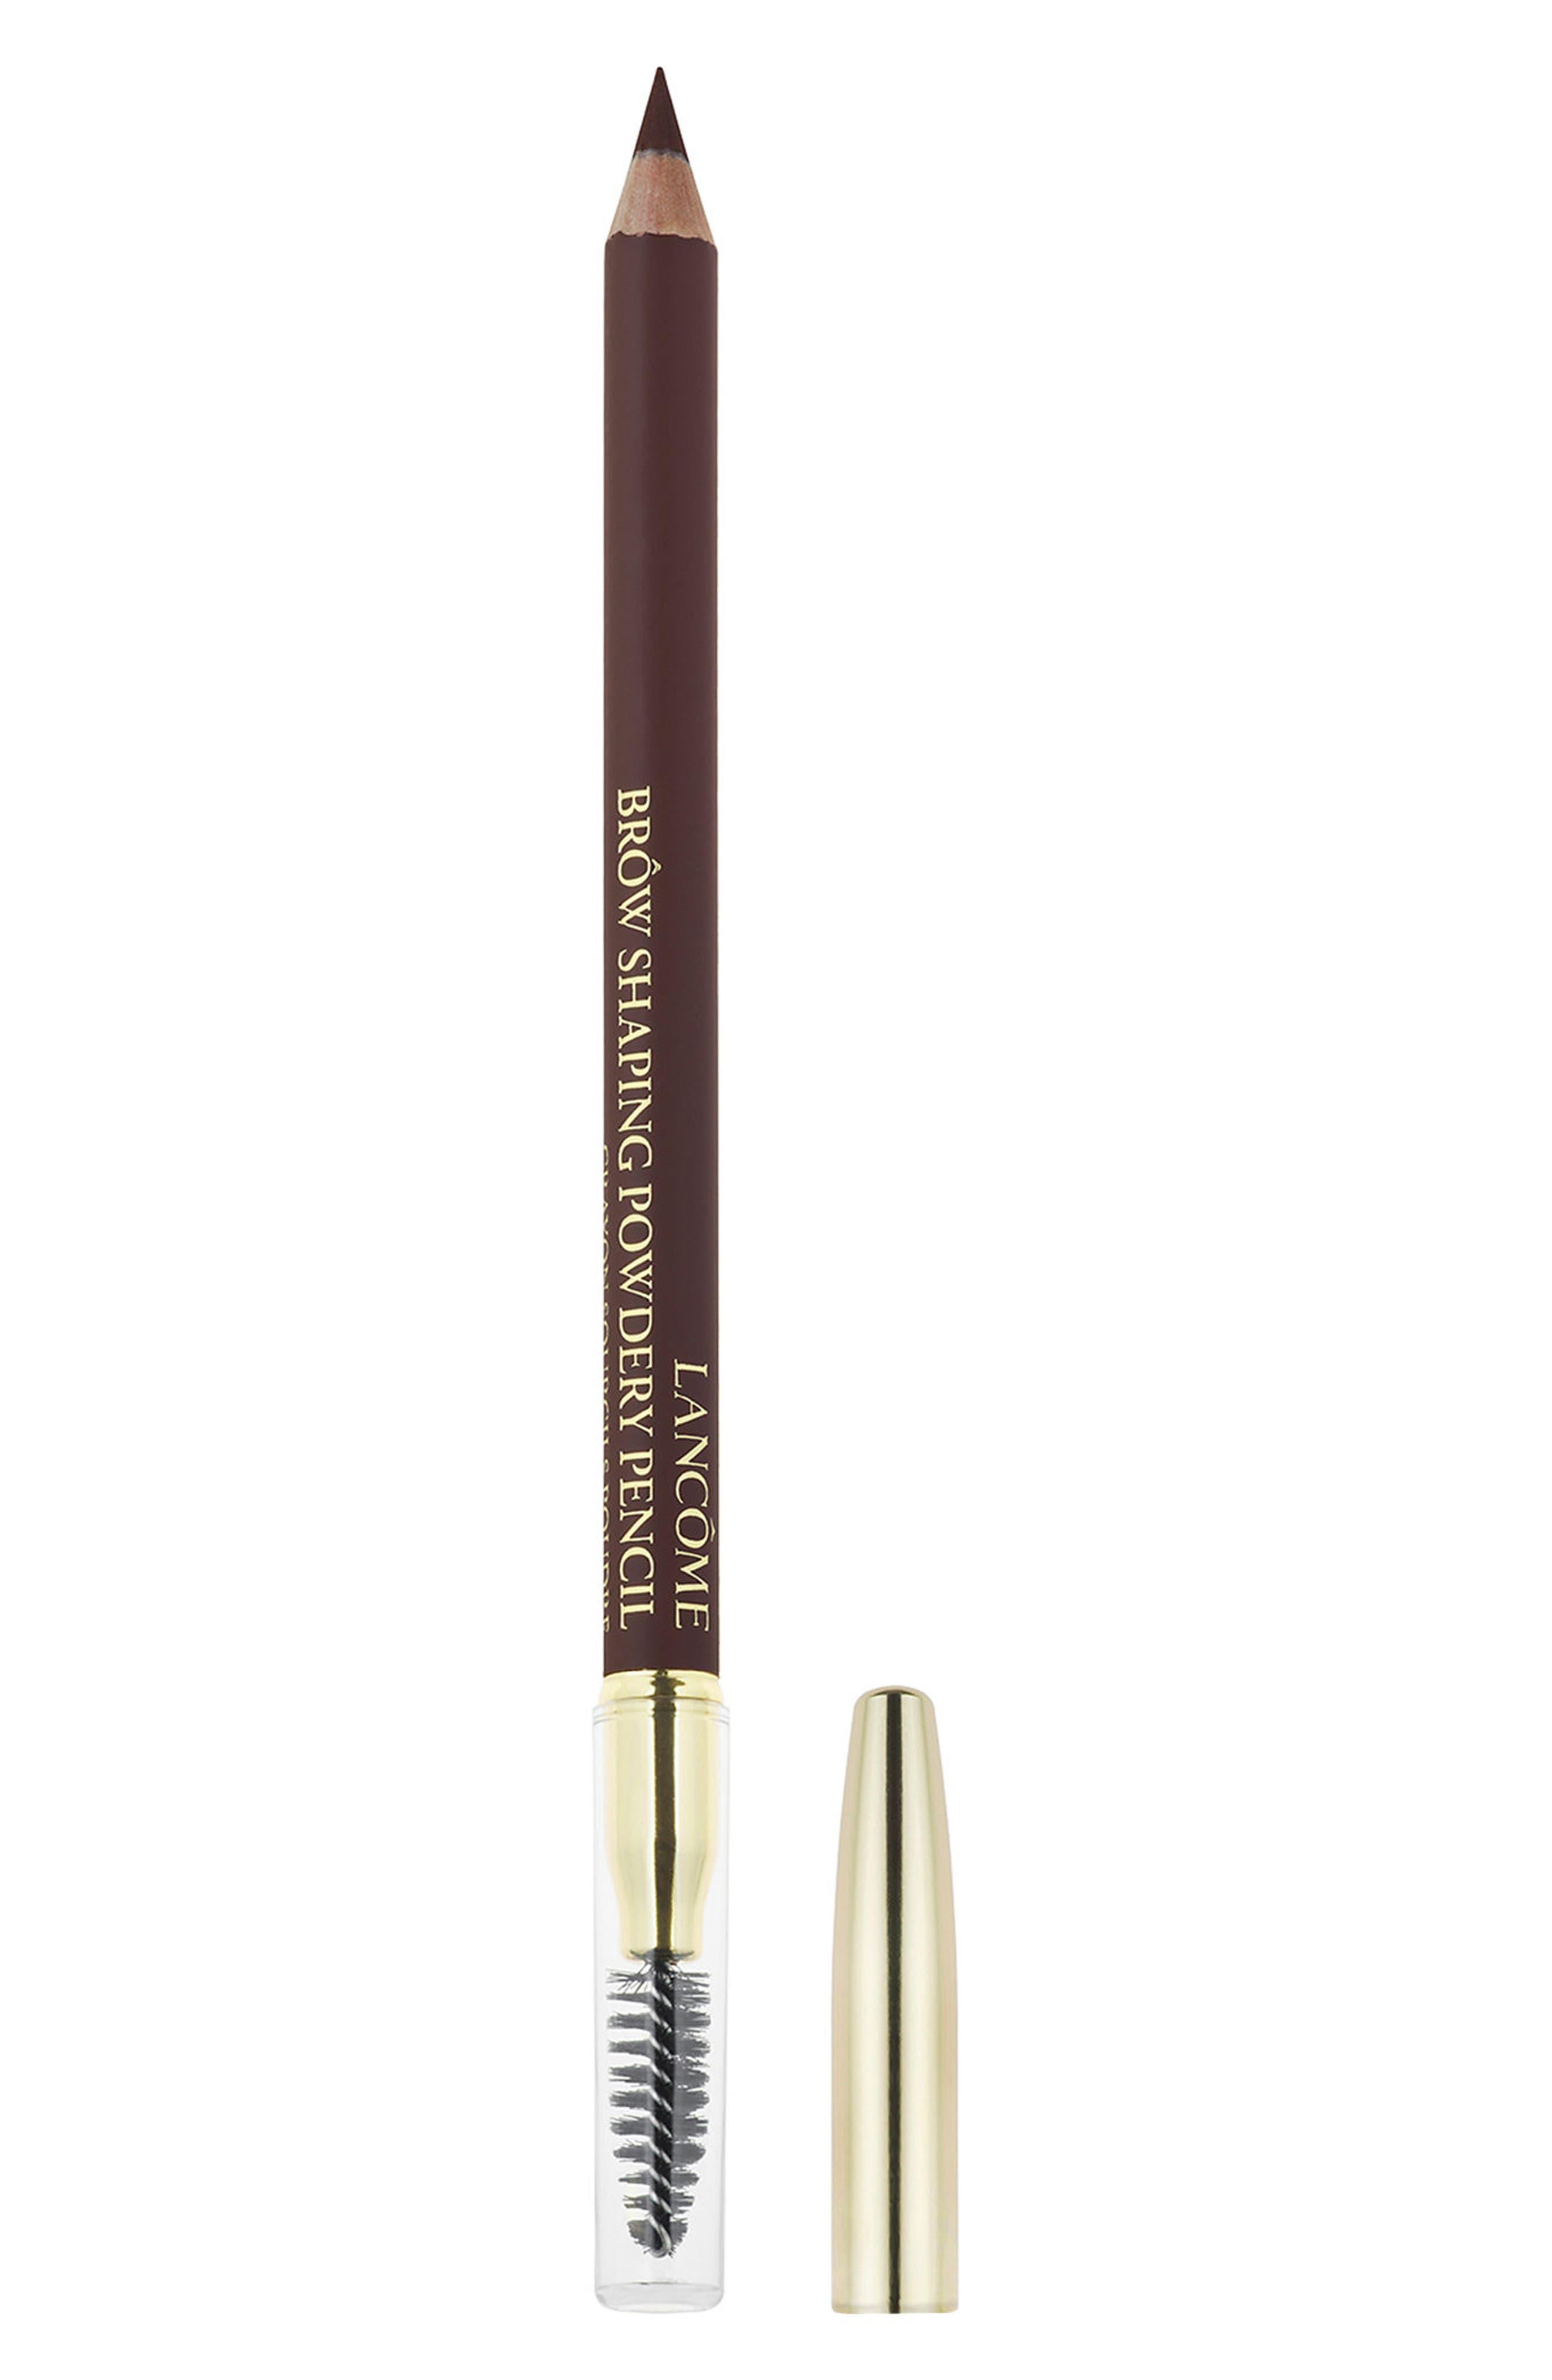 Lancome Brow Shaping Powdery Brow Pencil